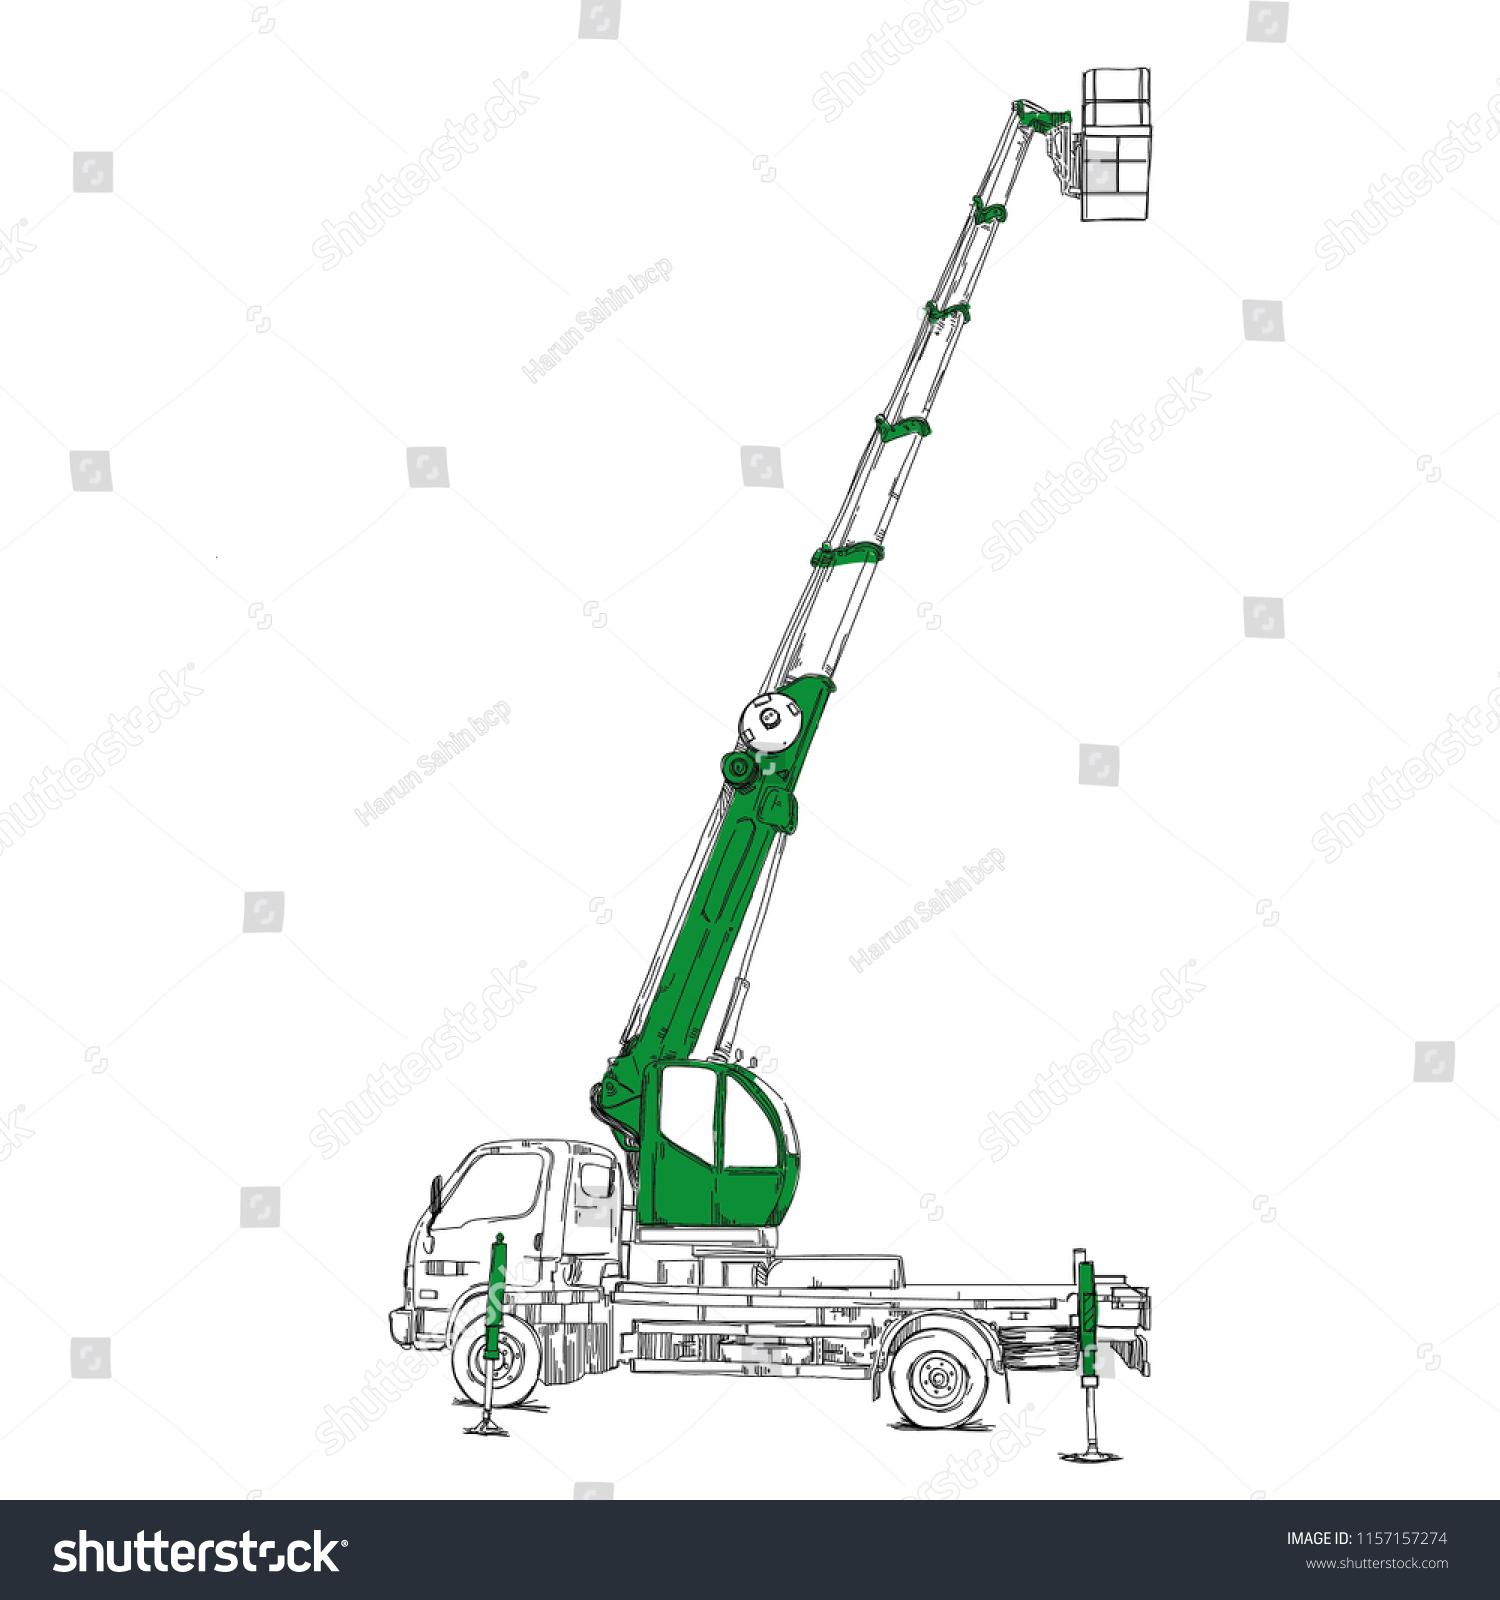 hight resolution of mobile crane sketch